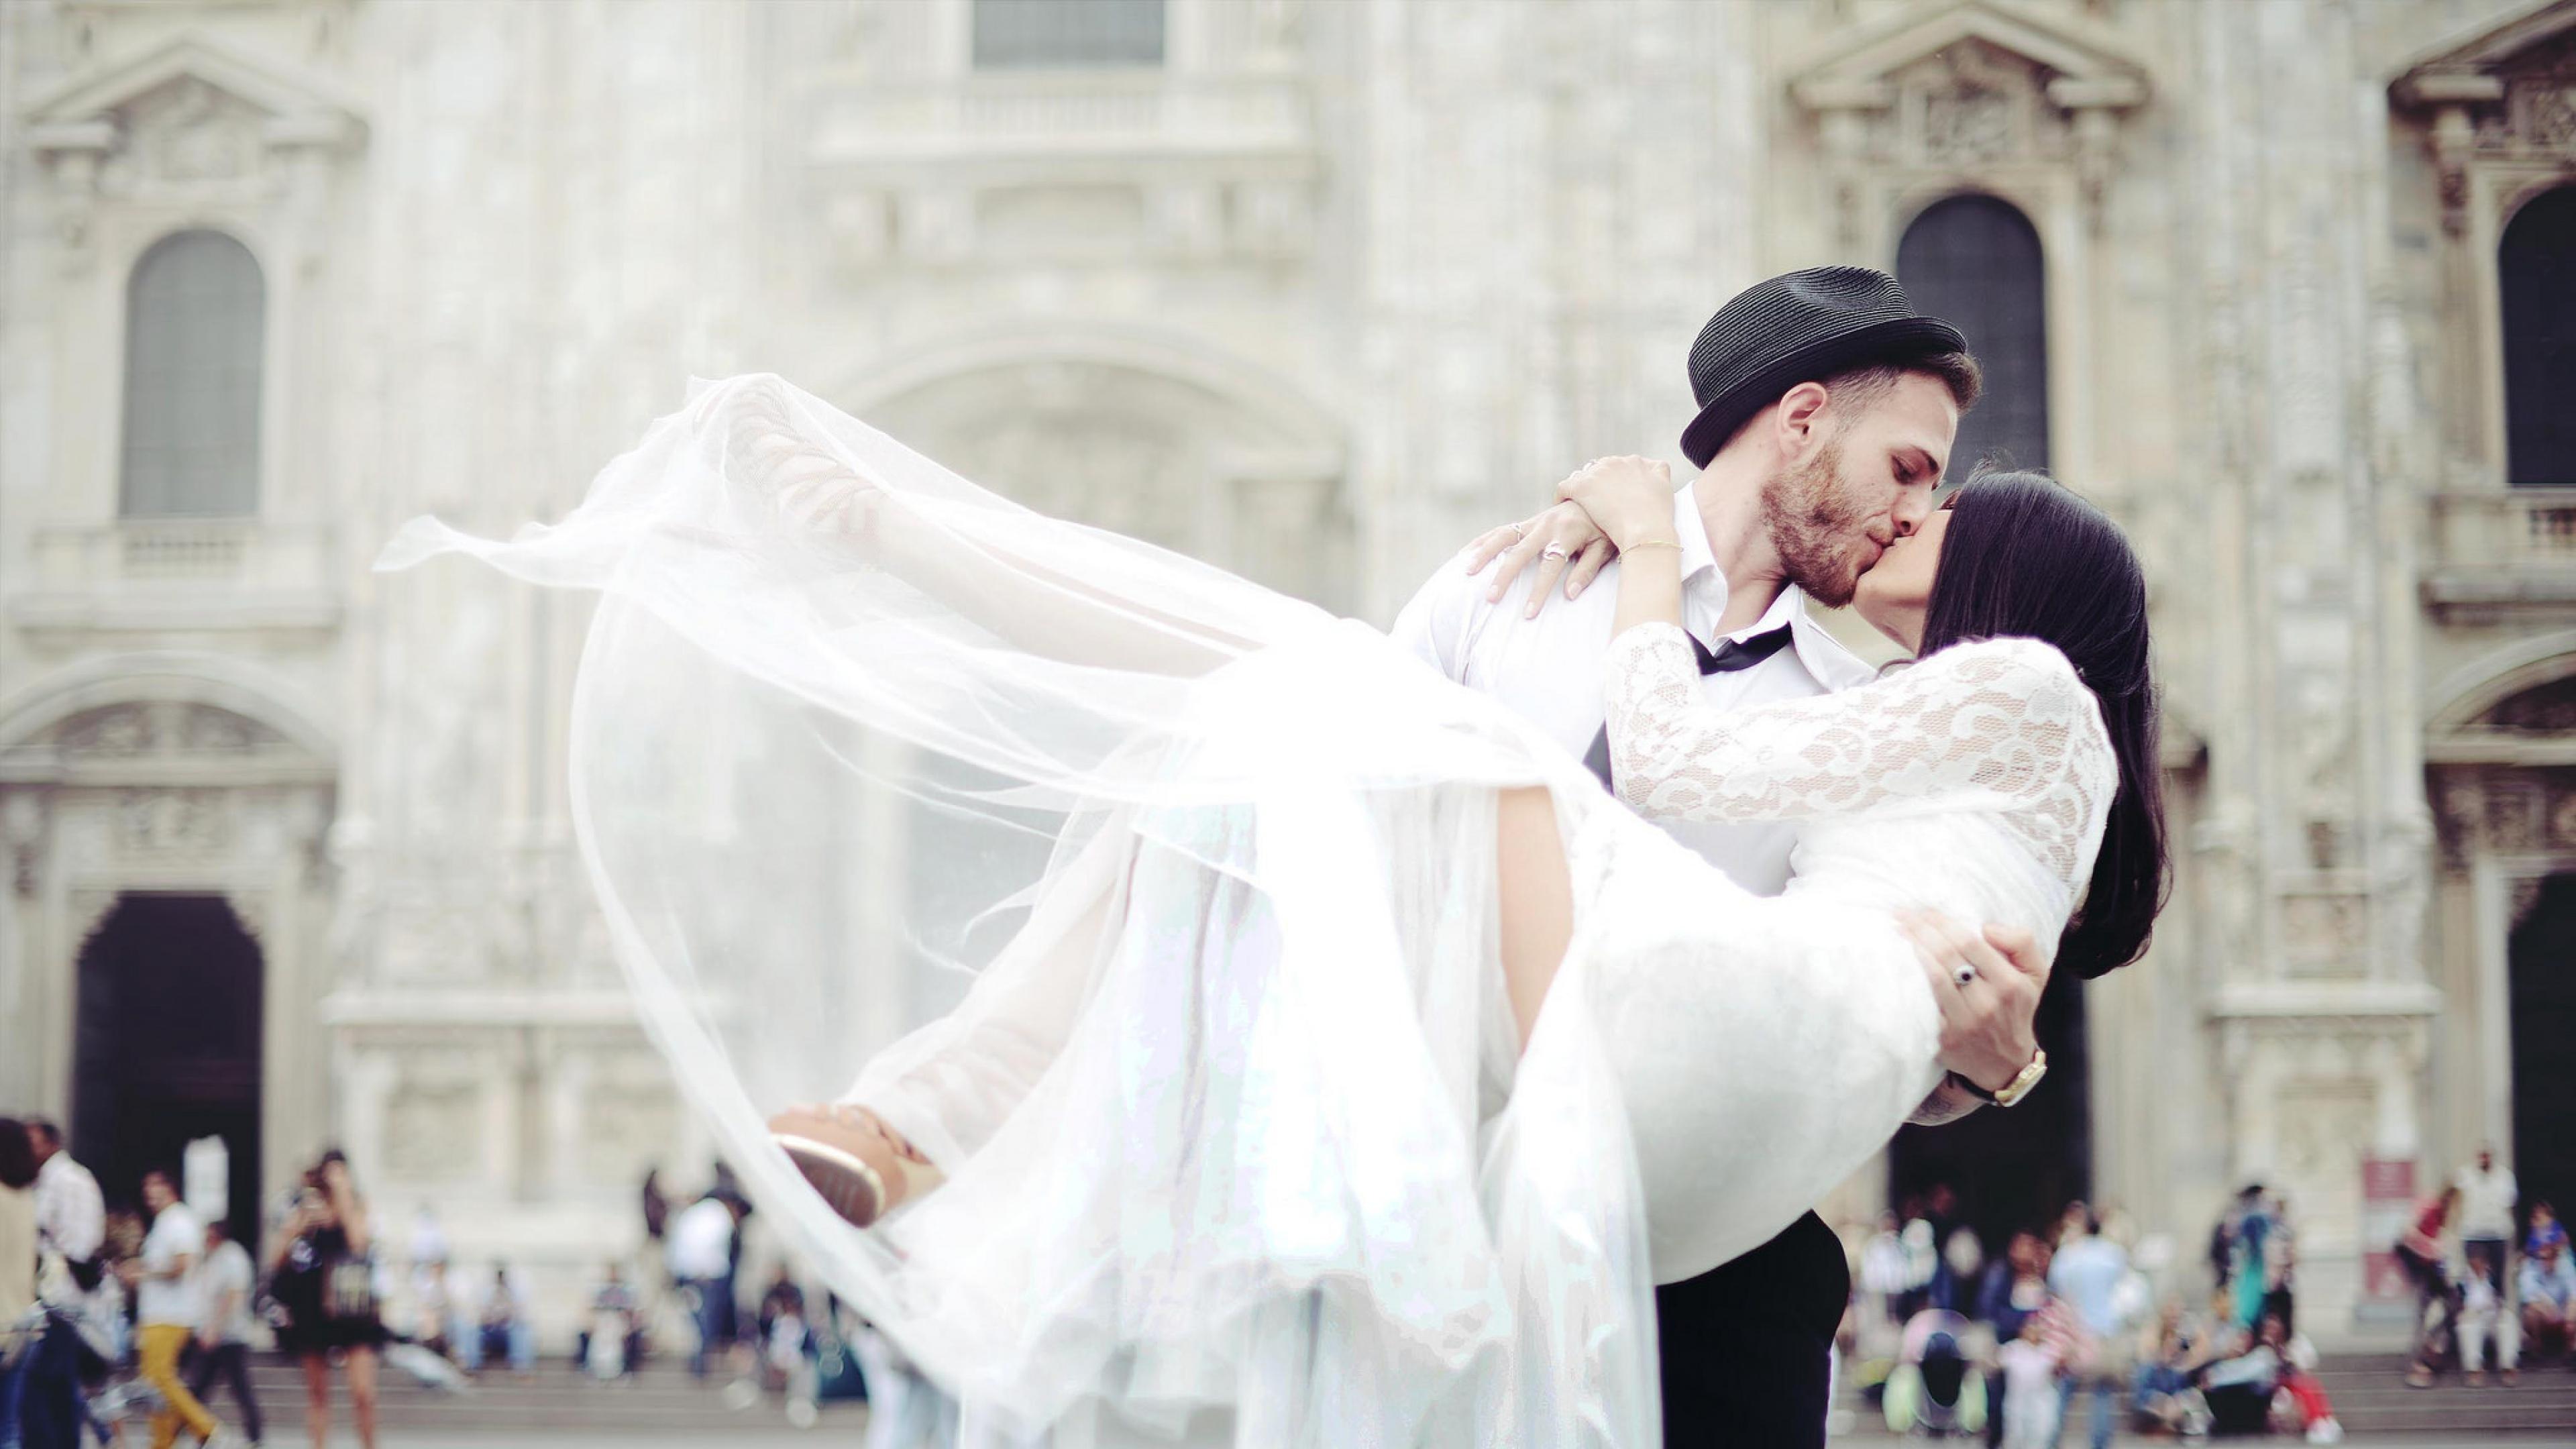 Wedding couple kissing hd love 4k wallpapers images - 4k kiss wallpaper ...